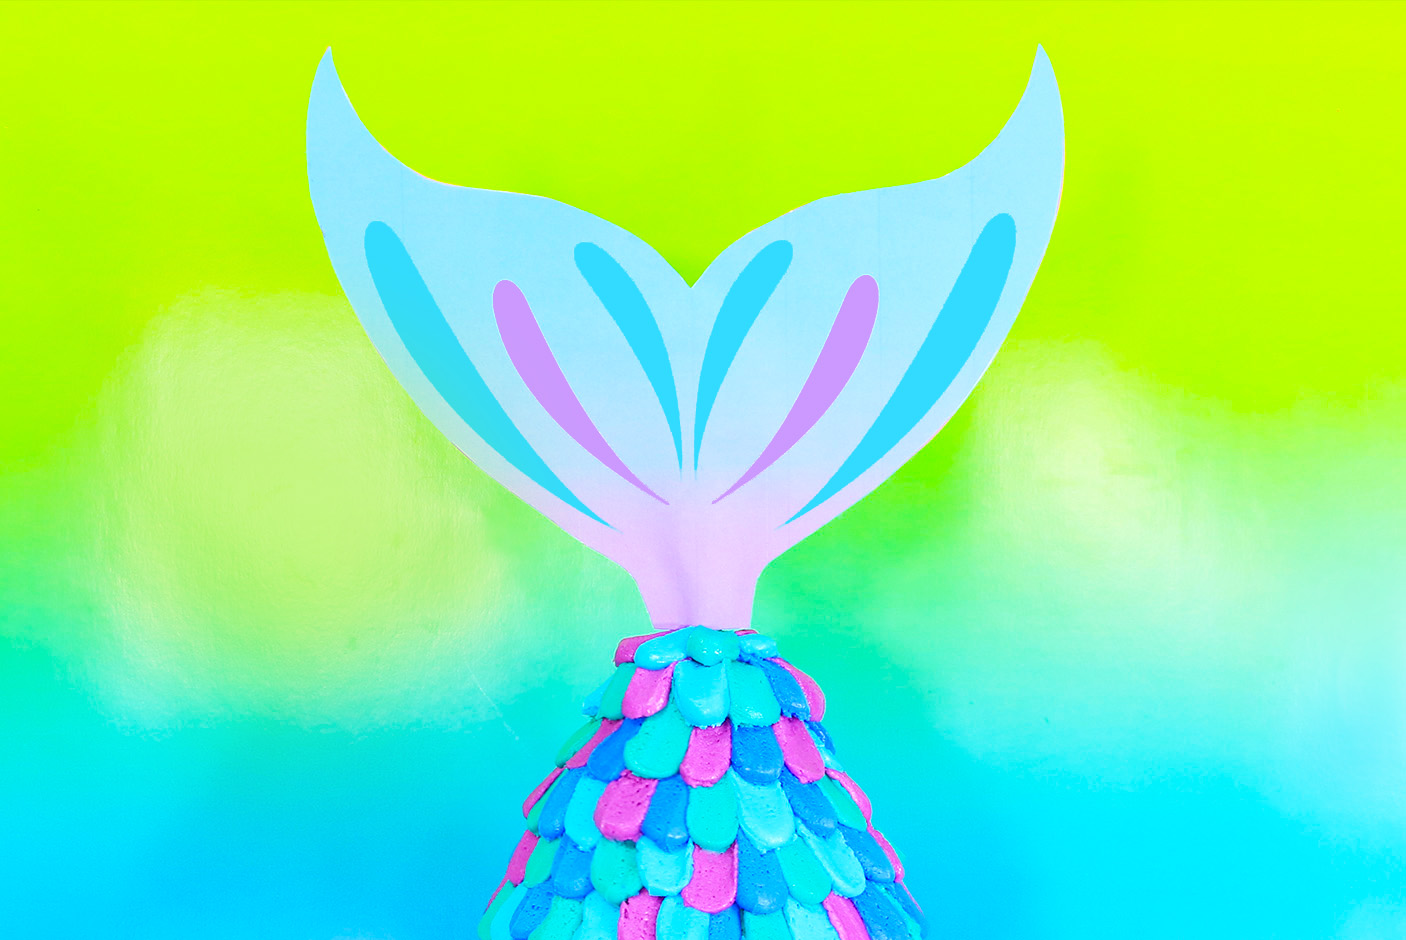 photo regarding Mermaid Tail Template Printable named Mermaid Tail Cake!